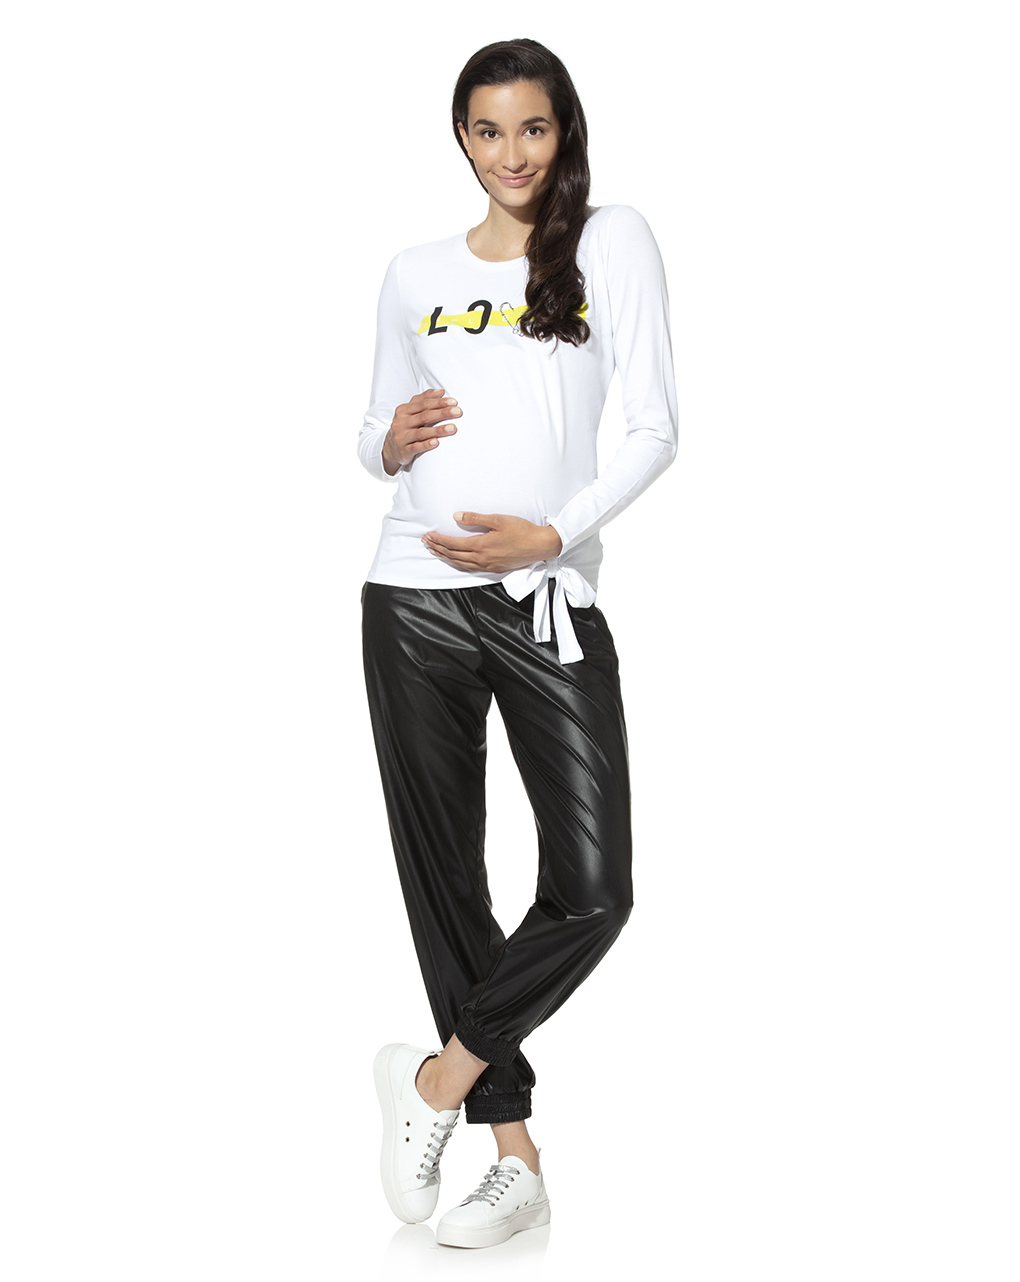 Pantalone premaman in ecopelle - Prénatal